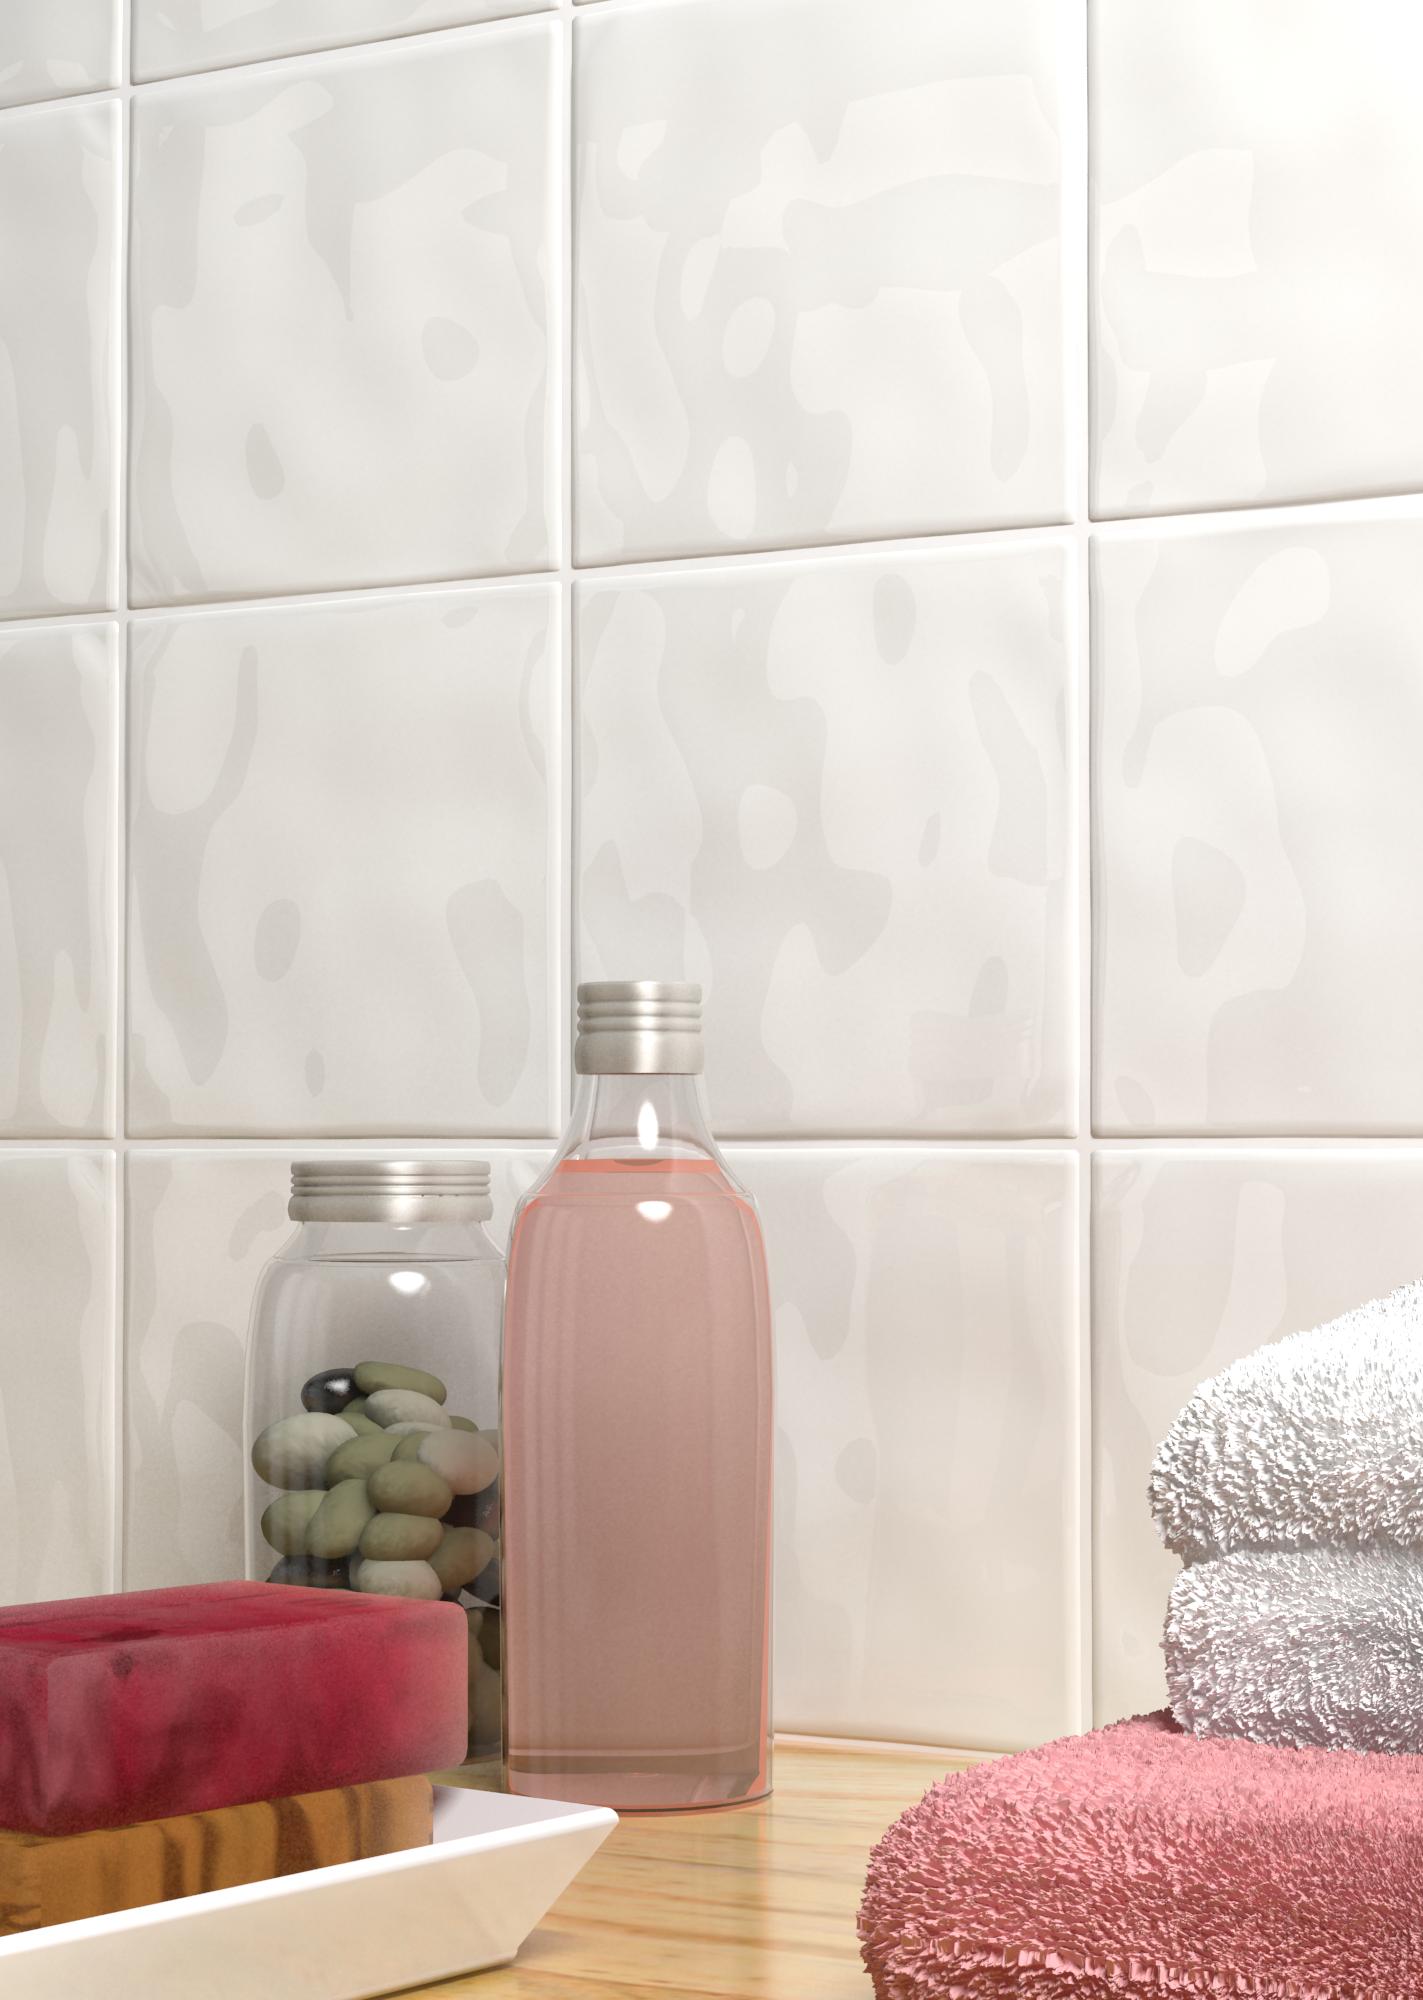 Bumpy Gloss White Textured Tiles | White tiles, Subtle textures and ...